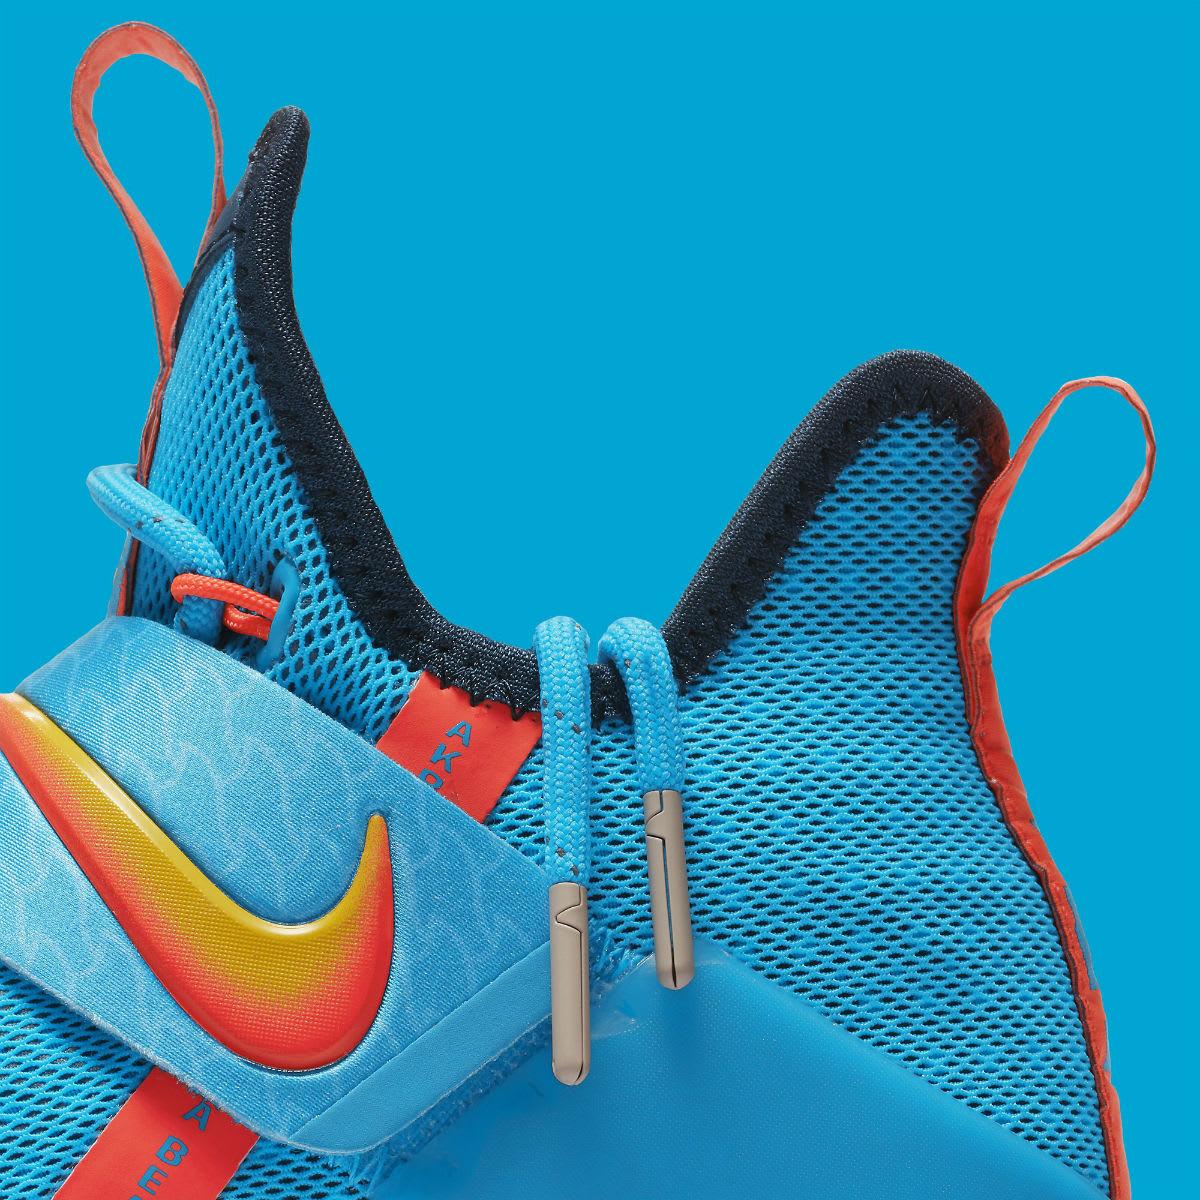 Nike LeBron 14 GS Cocoa Beach Release Date Collar 859468-477